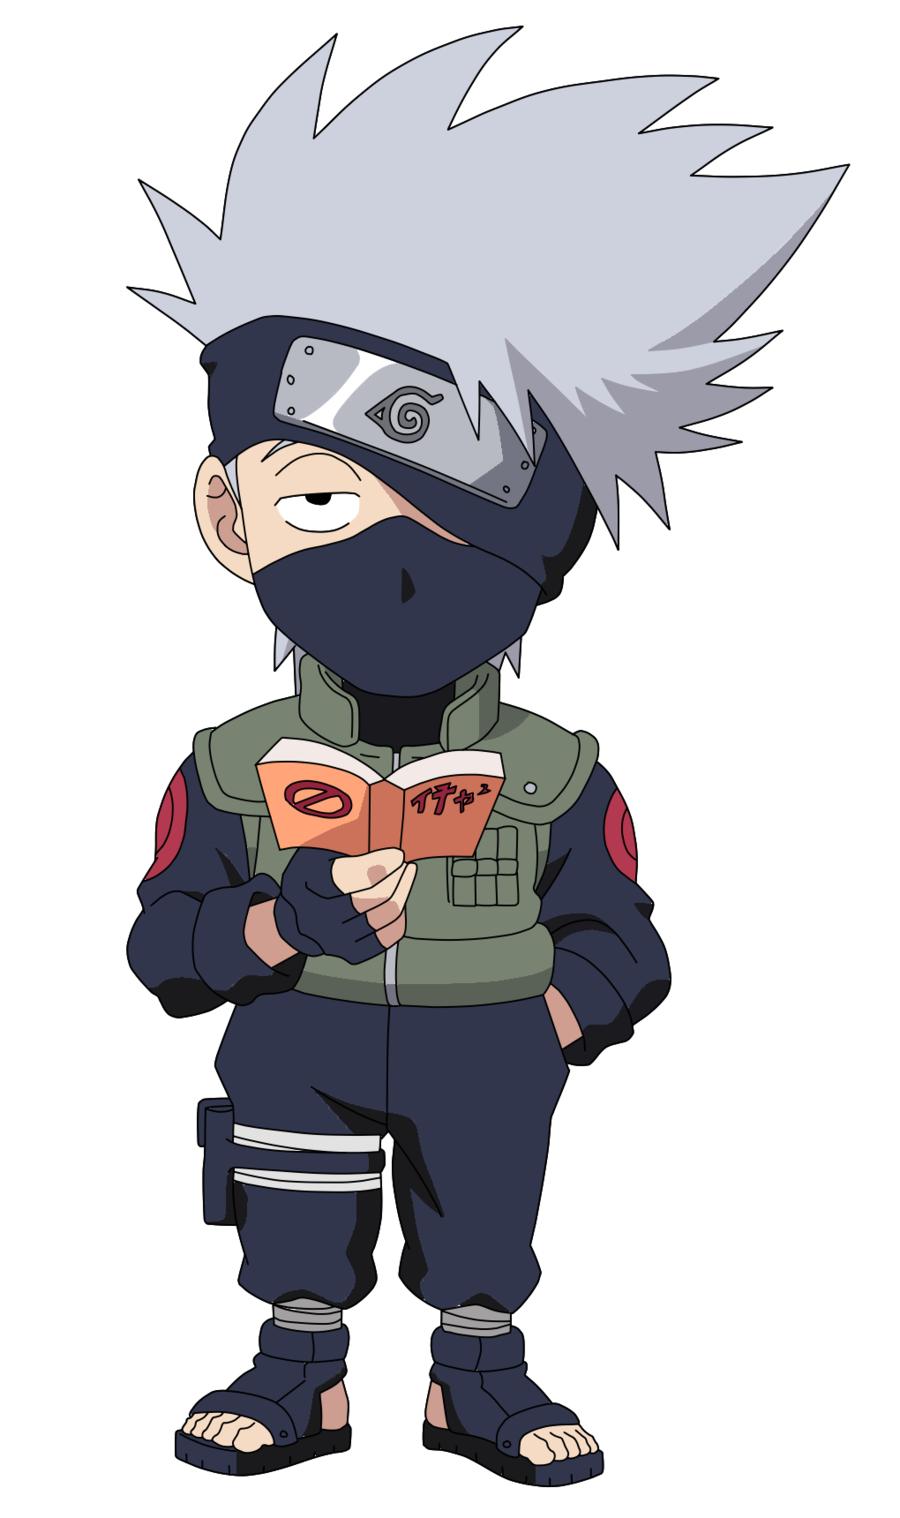 Img Clipartfox Com 64f7ede492116e2d29c2fd4185bc574a Kakashi Backgrounds 6251 Hd Kakashi Hatake Clipart Hd 900 1518 Png Anime Chibi Naruto Kakashi Chibi